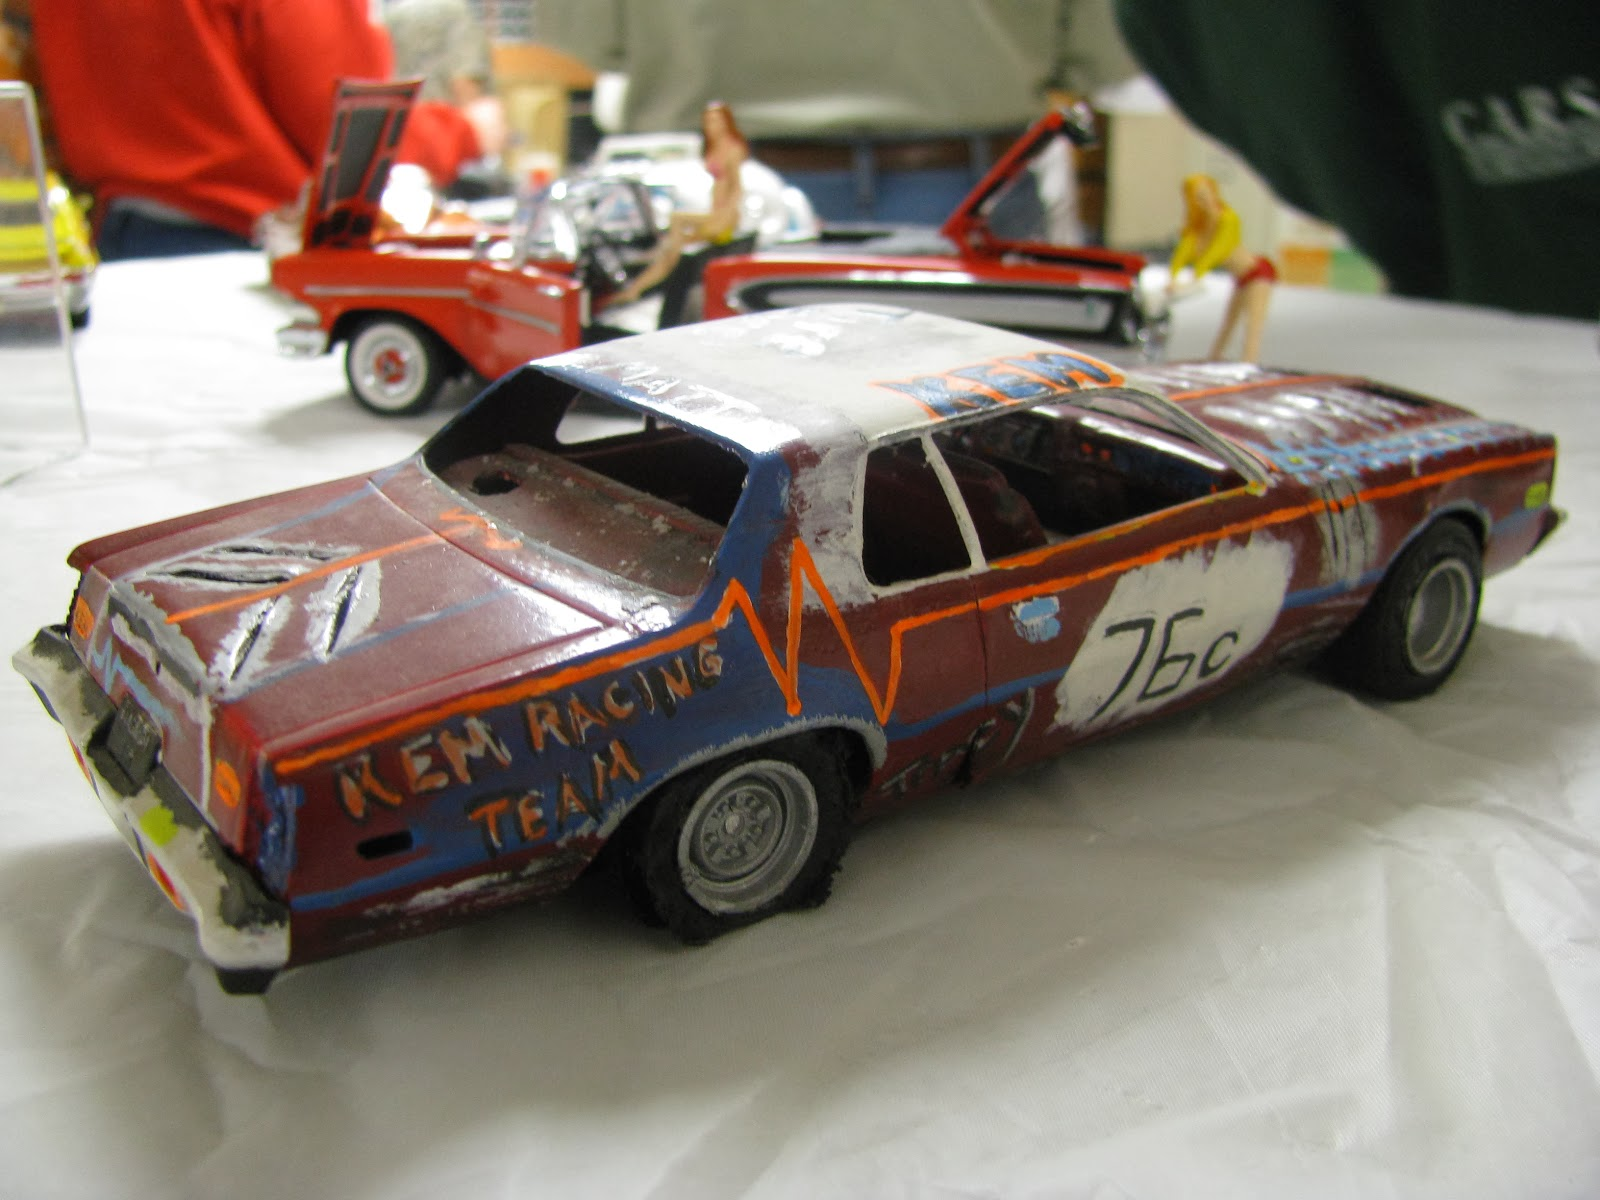 Building Demolition Derby Car : Hazel home art and antiques wausau wisconsin vintage car